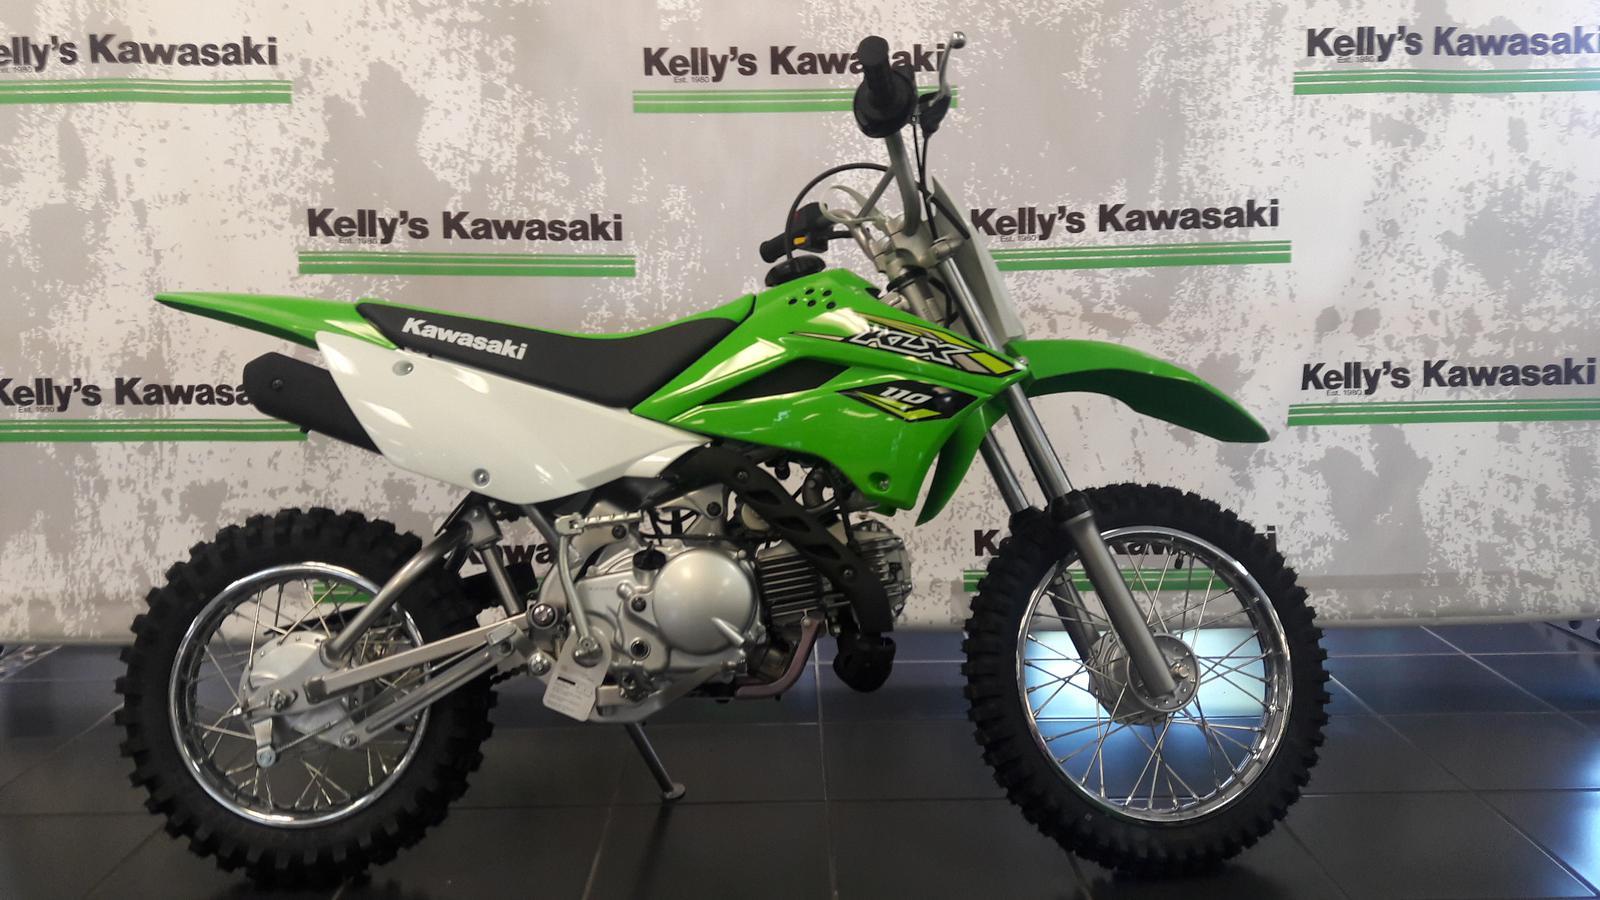 2018 Kawasaki KLX 110 for sale in Mesa, AZ. Kelly's Kawasaki Mesa ...